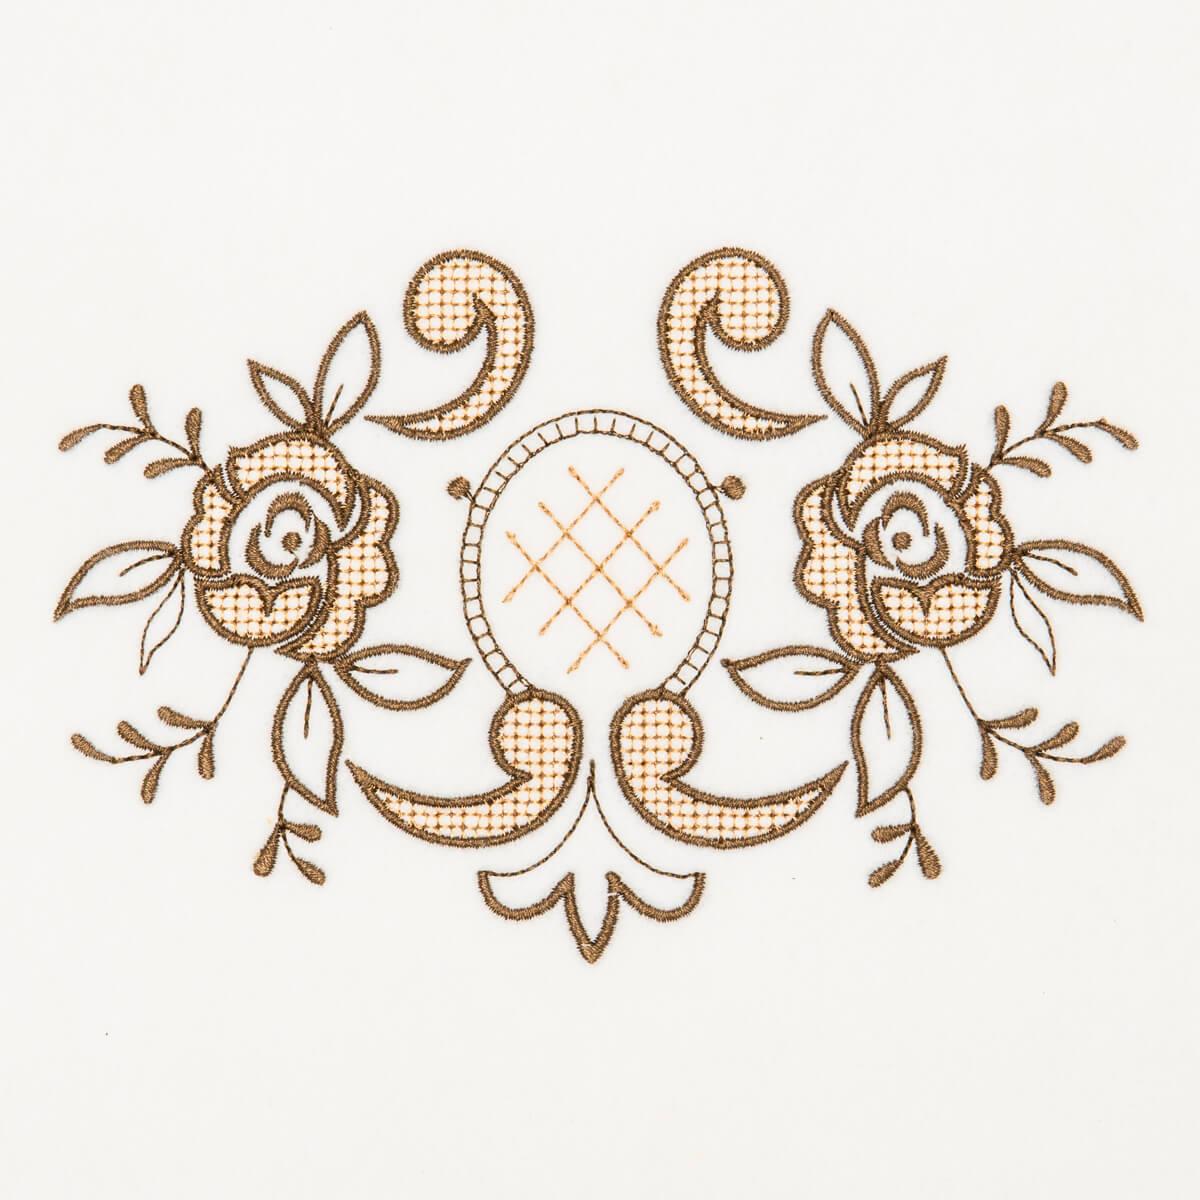 Matriz de bordado floral 378